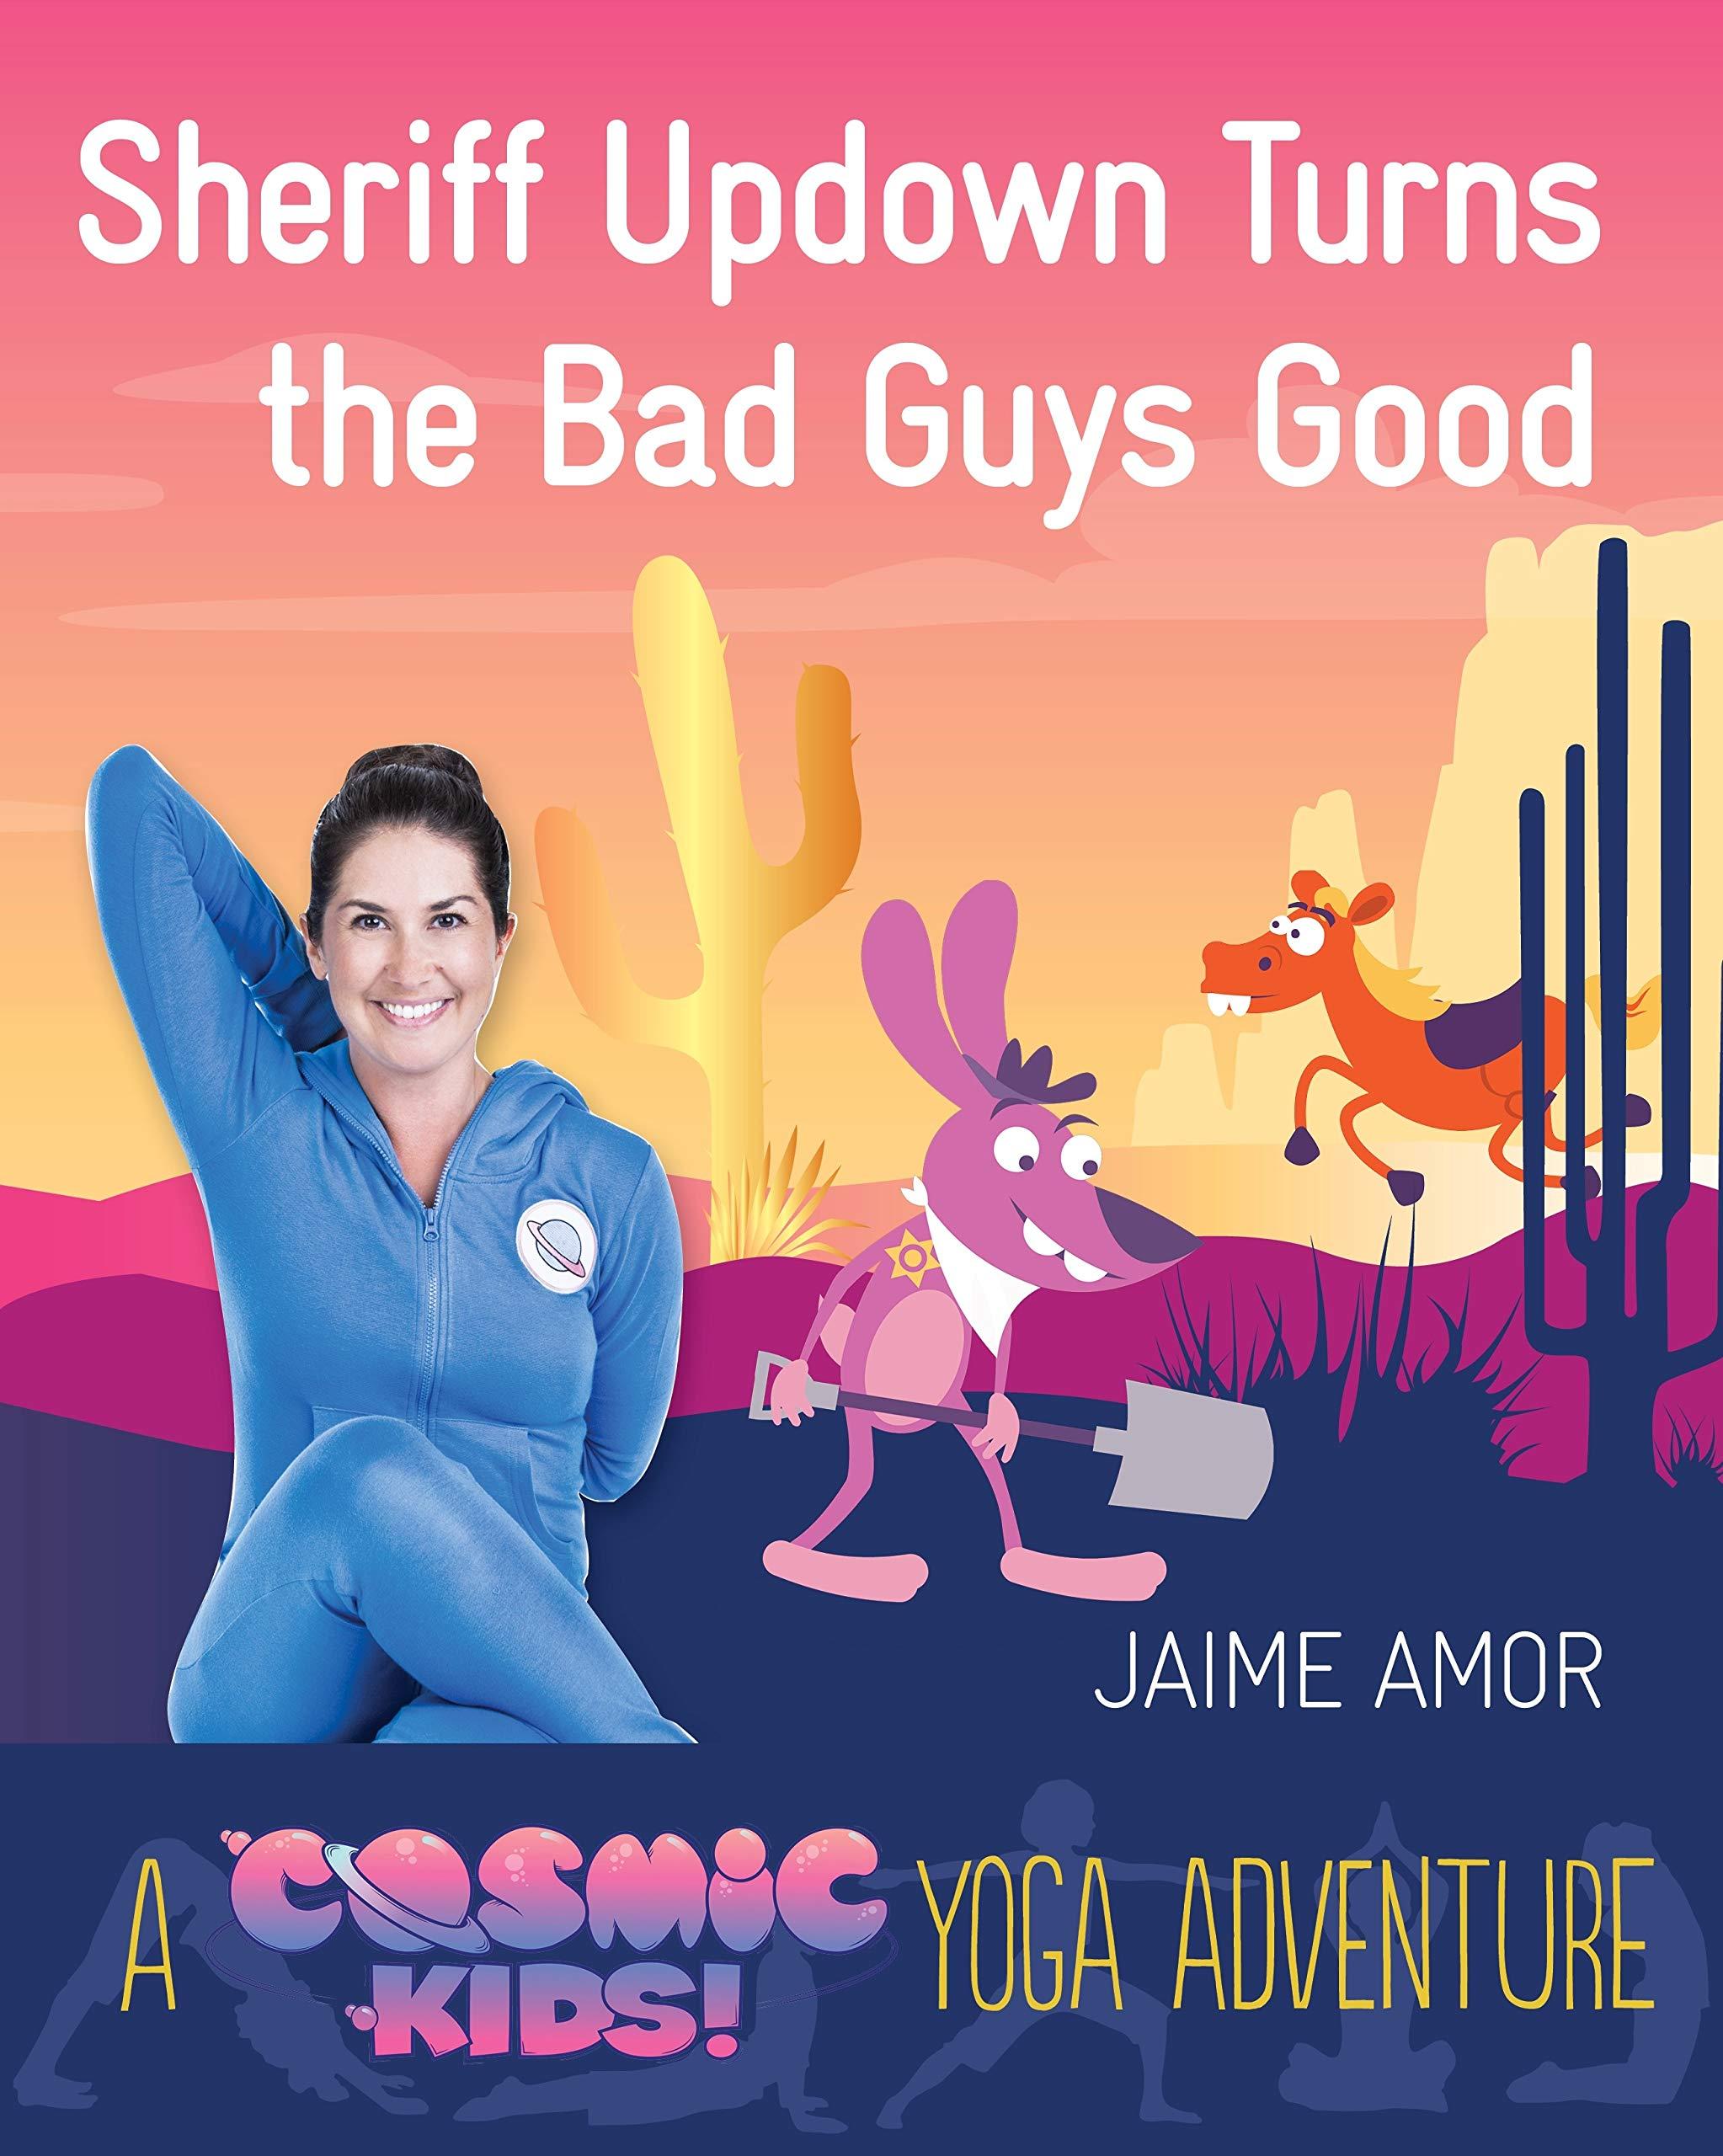 Amazon Com Sheriff Updown Turns The Bad Guys Good A Cosmic Kids Yoga Adventure 9781780289588 Amor Jaime Books